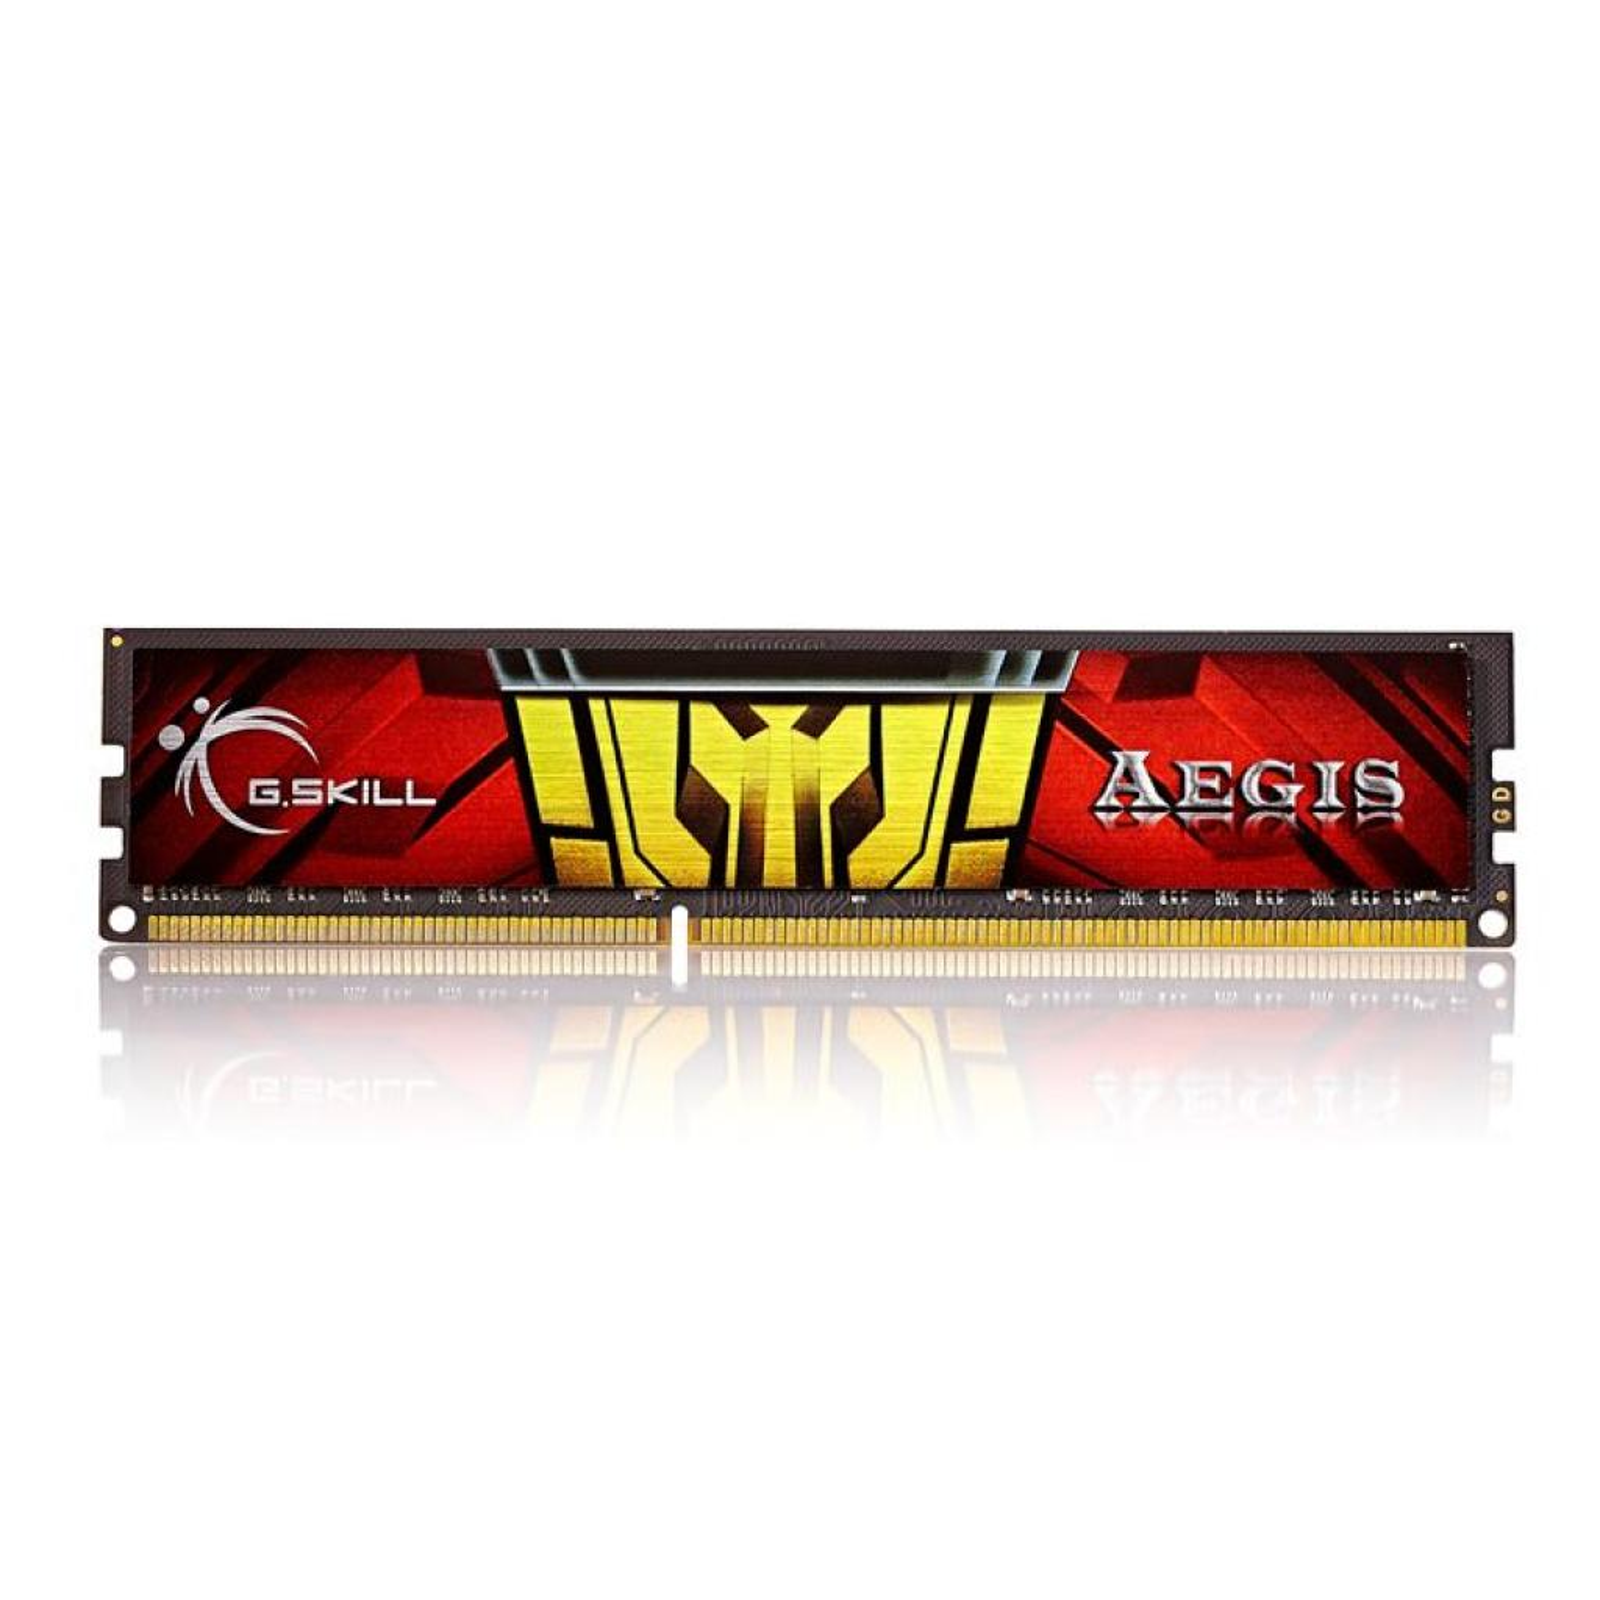 Модуль памяти для компьютера DDR3 4GB 1333 MHz G.Skill (F3-1333C9S-4GIS)